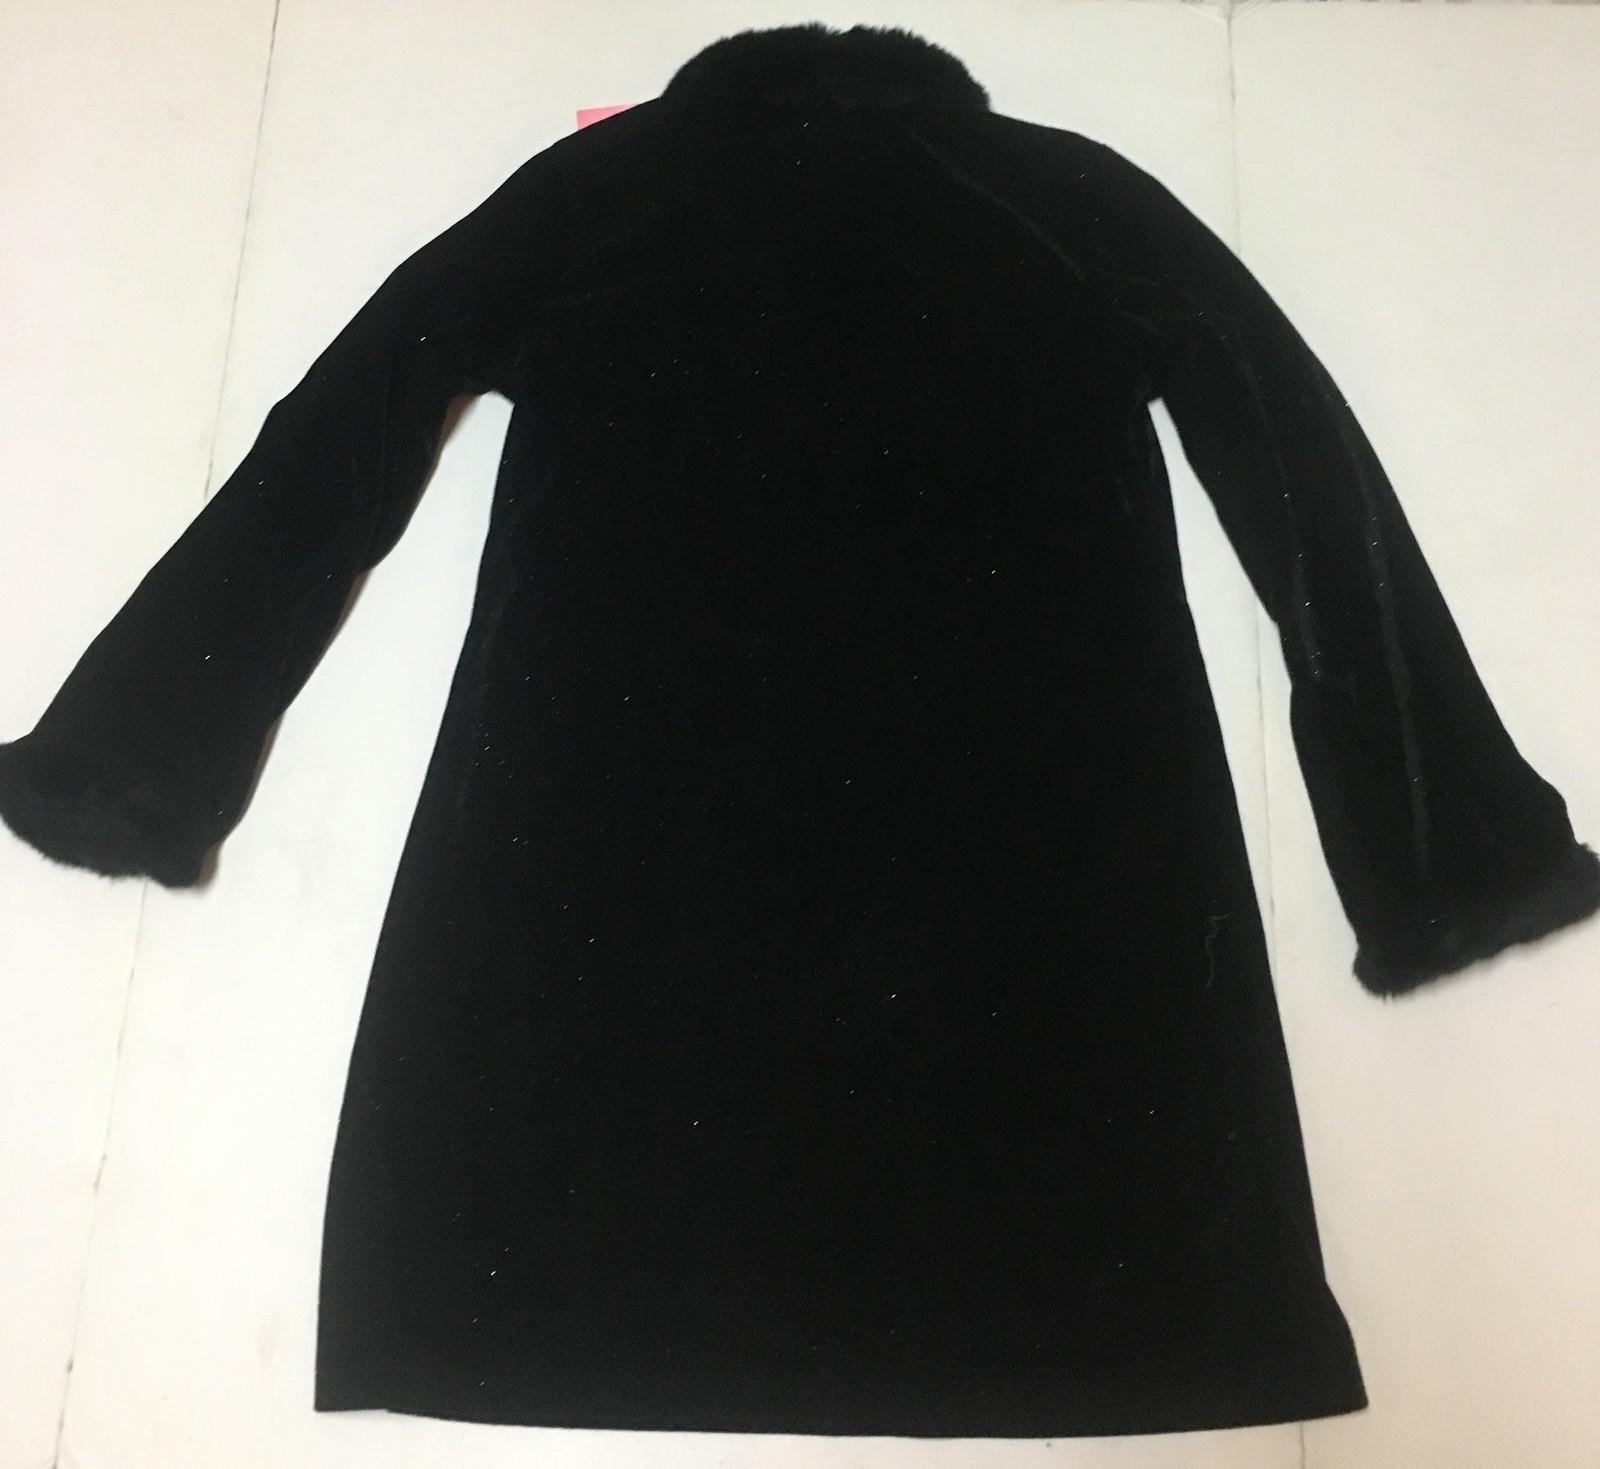 Camp Beverly Hills Black Sparkly Dress Sz 10/12 Faux Fur Trim